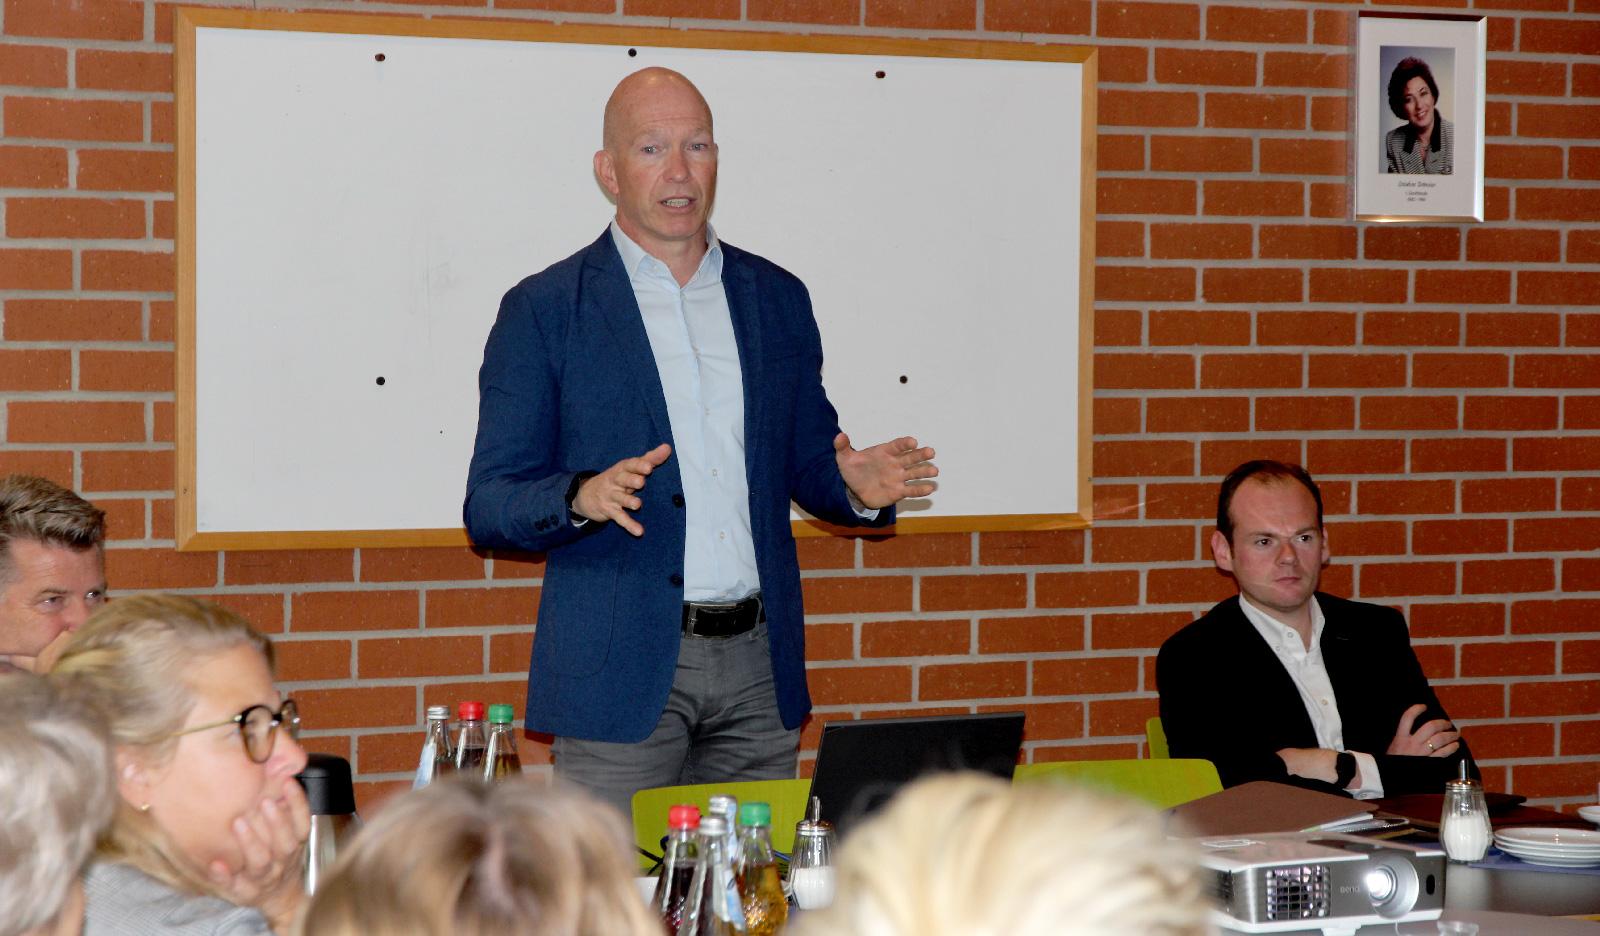 Thomas Brunner, Brunner & Schmidt, bestellter Datenschutzbeauftragter der Lebenshilfe, erläuterte zu Neuerungen der Datengrunschutzverordnung der EU.